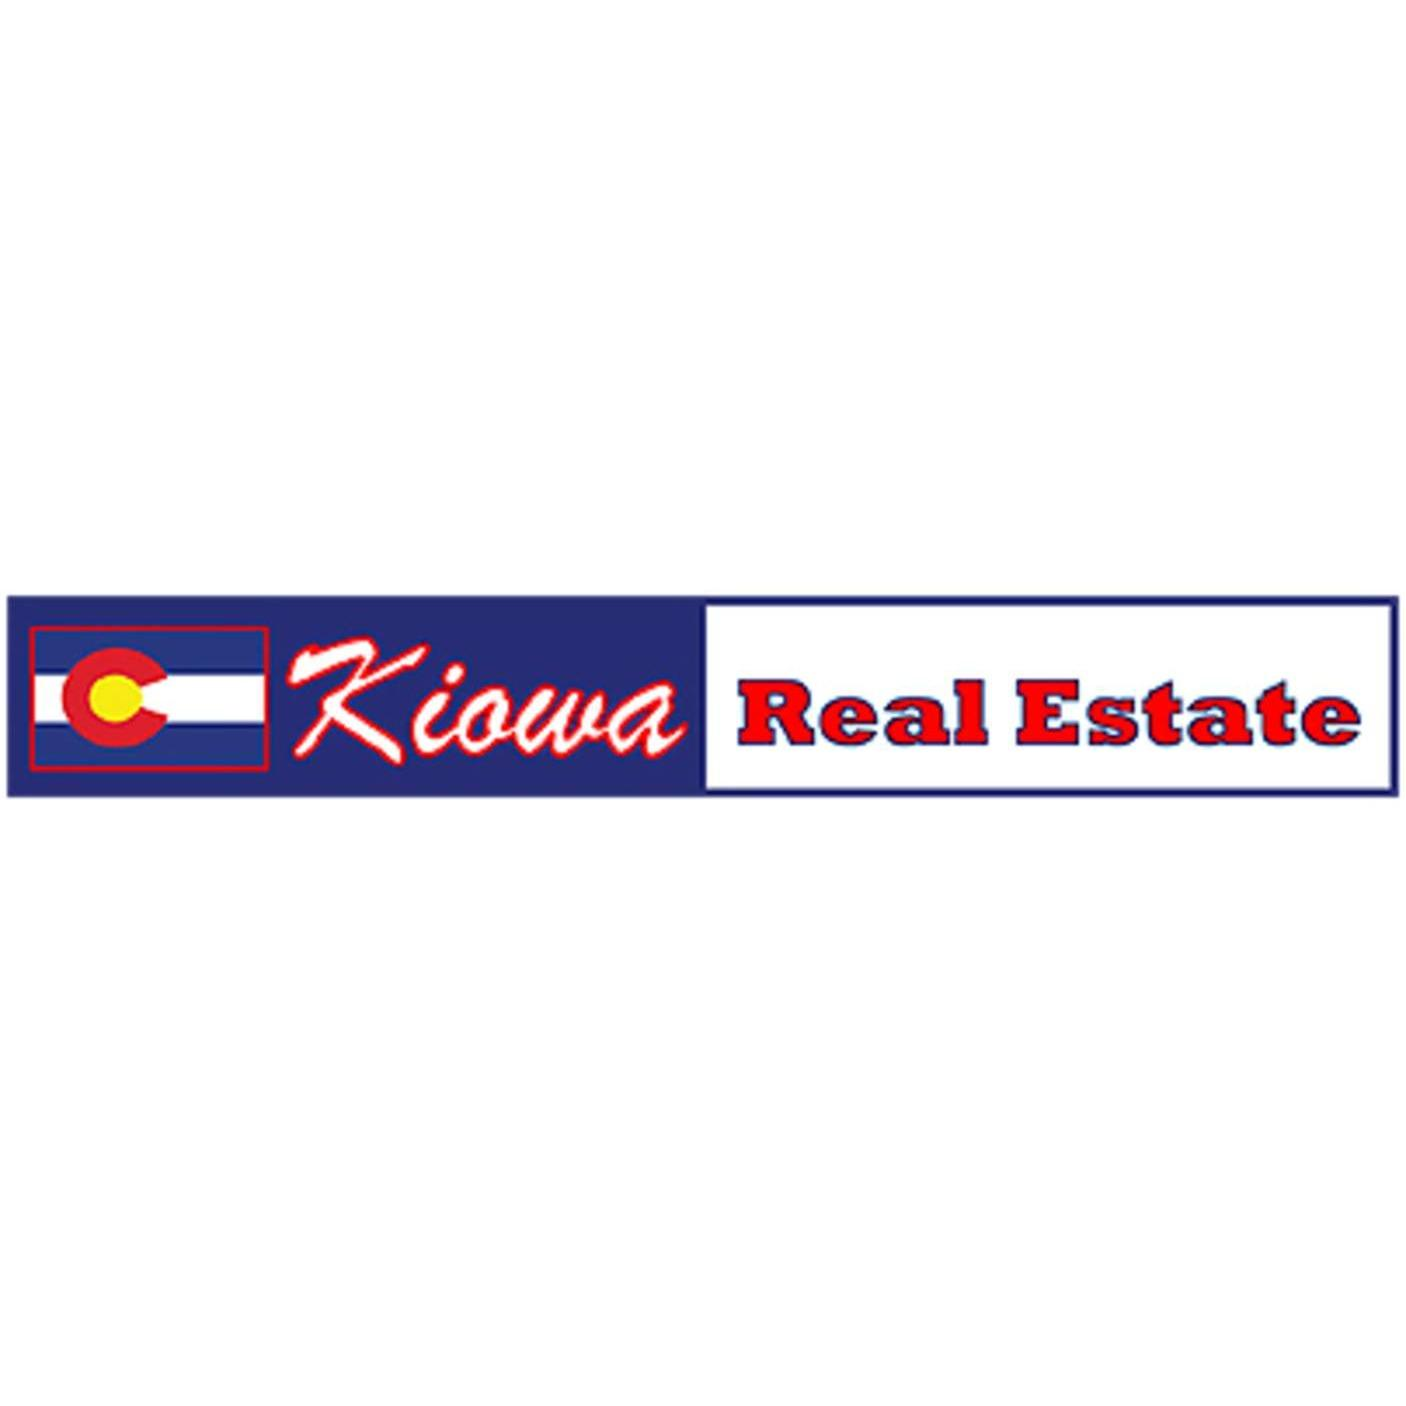 Patricia Arkebauer, Kiowa Real Estate image 0